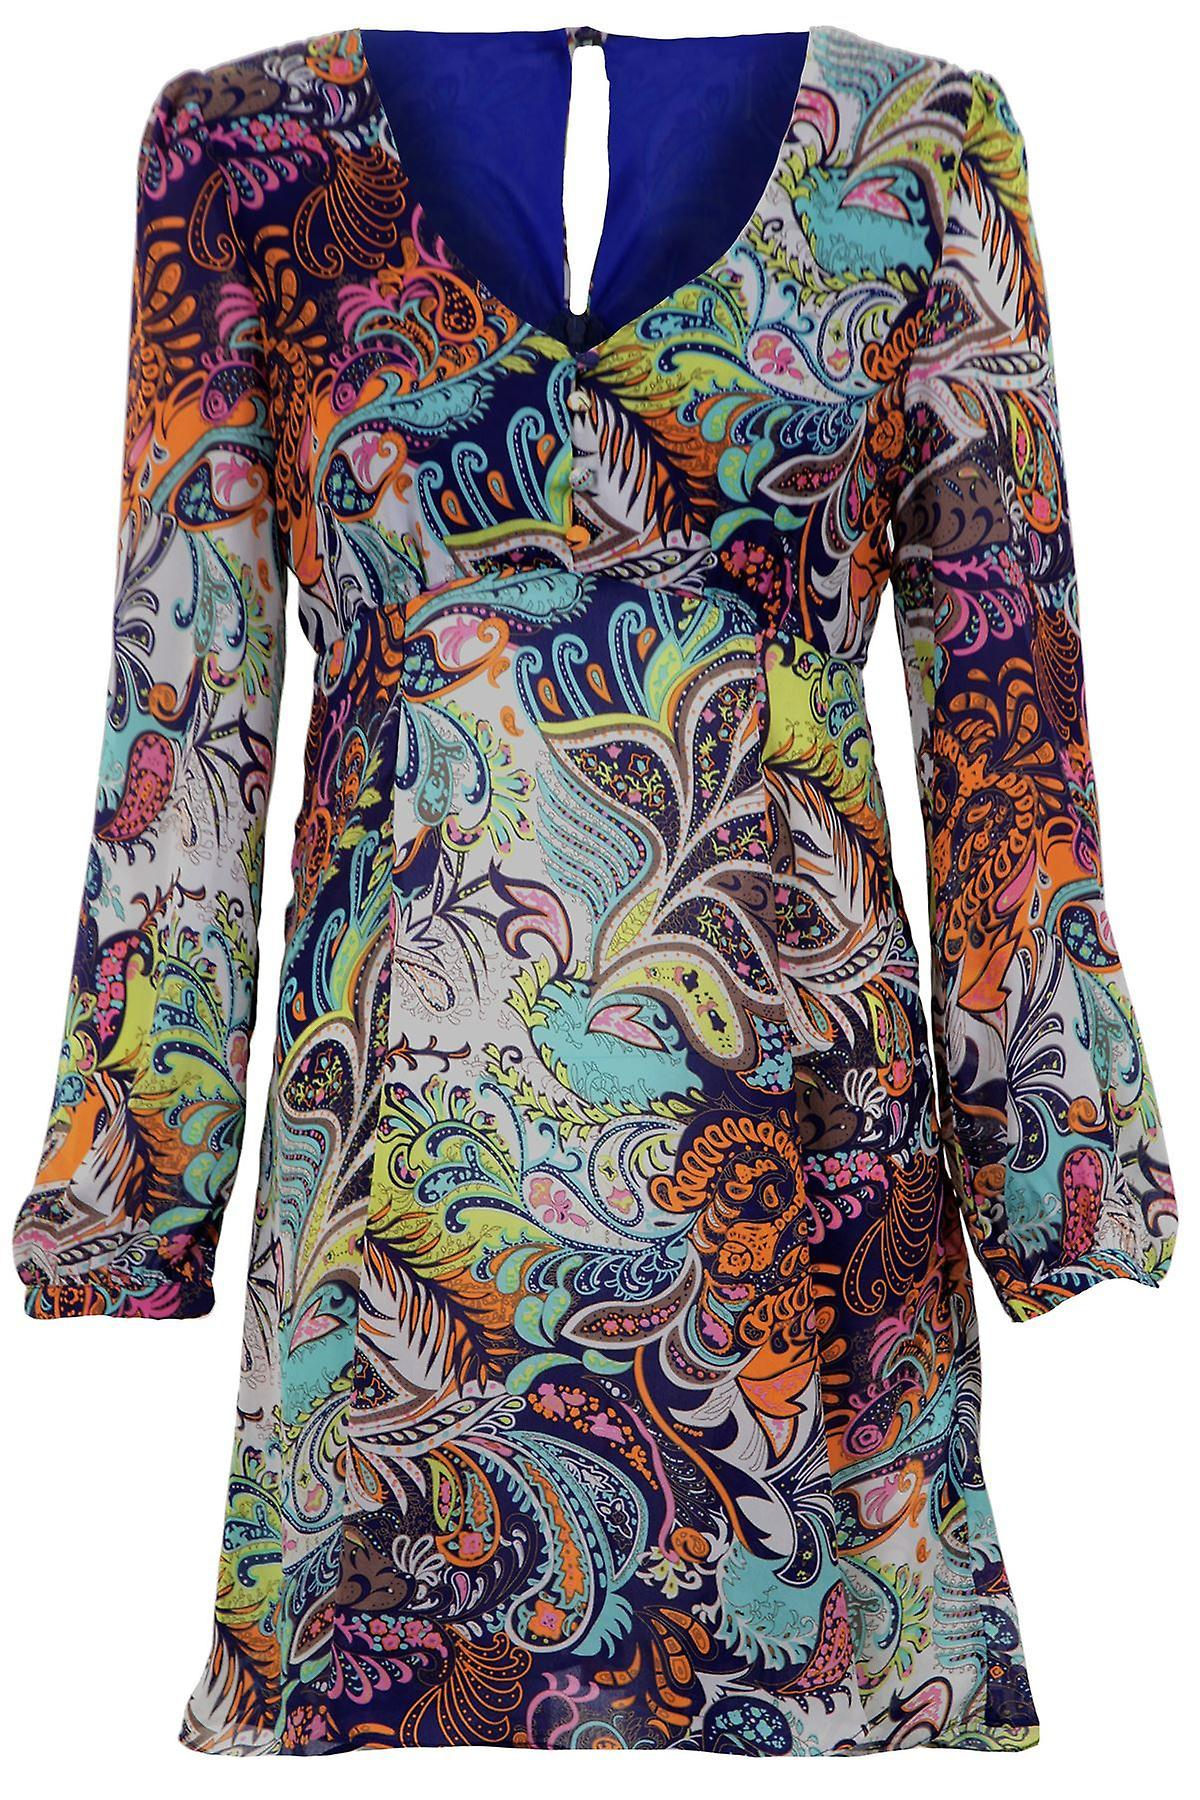 Ladies Long Sleeve Chiffon Multicoloured Paisley Print Women's Dress